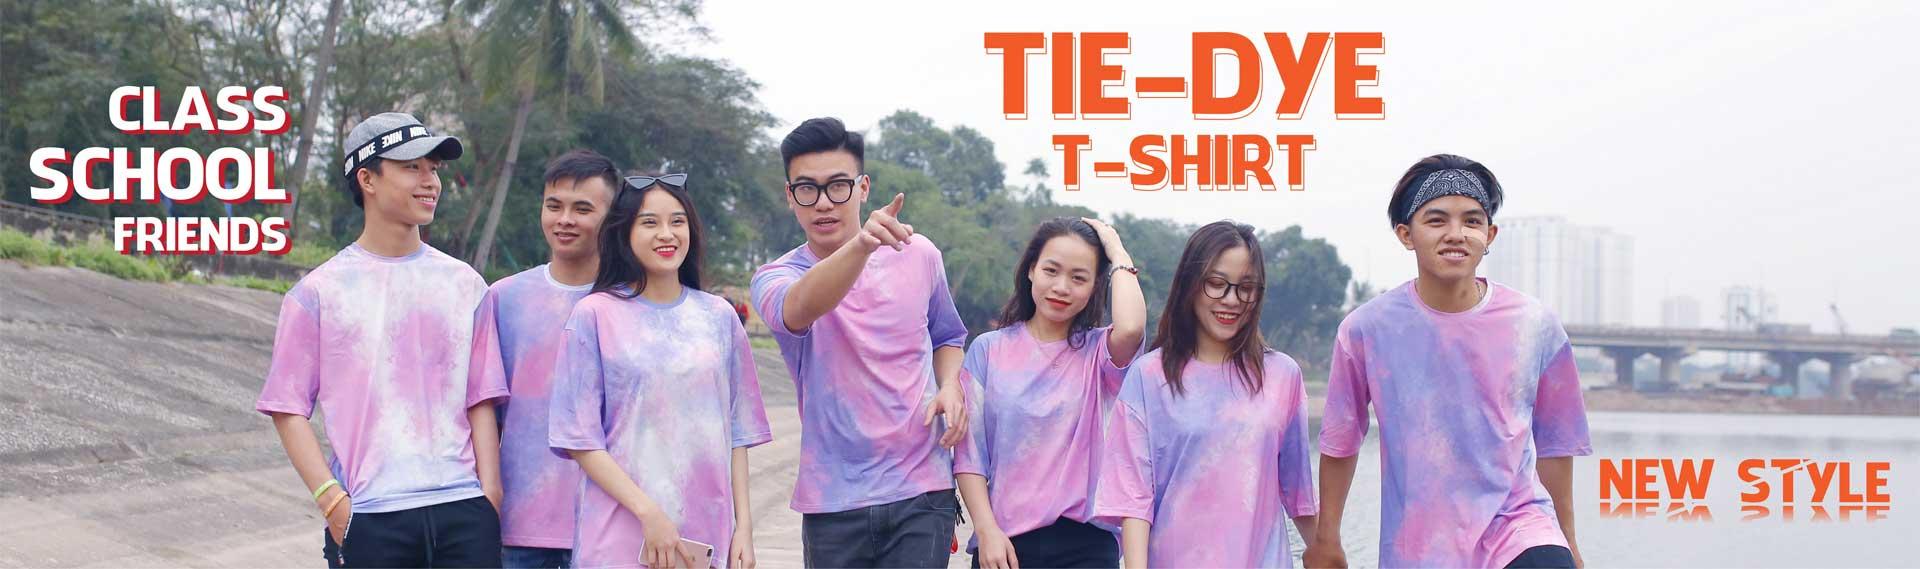 ao-lop-tie-dye-t-shirt